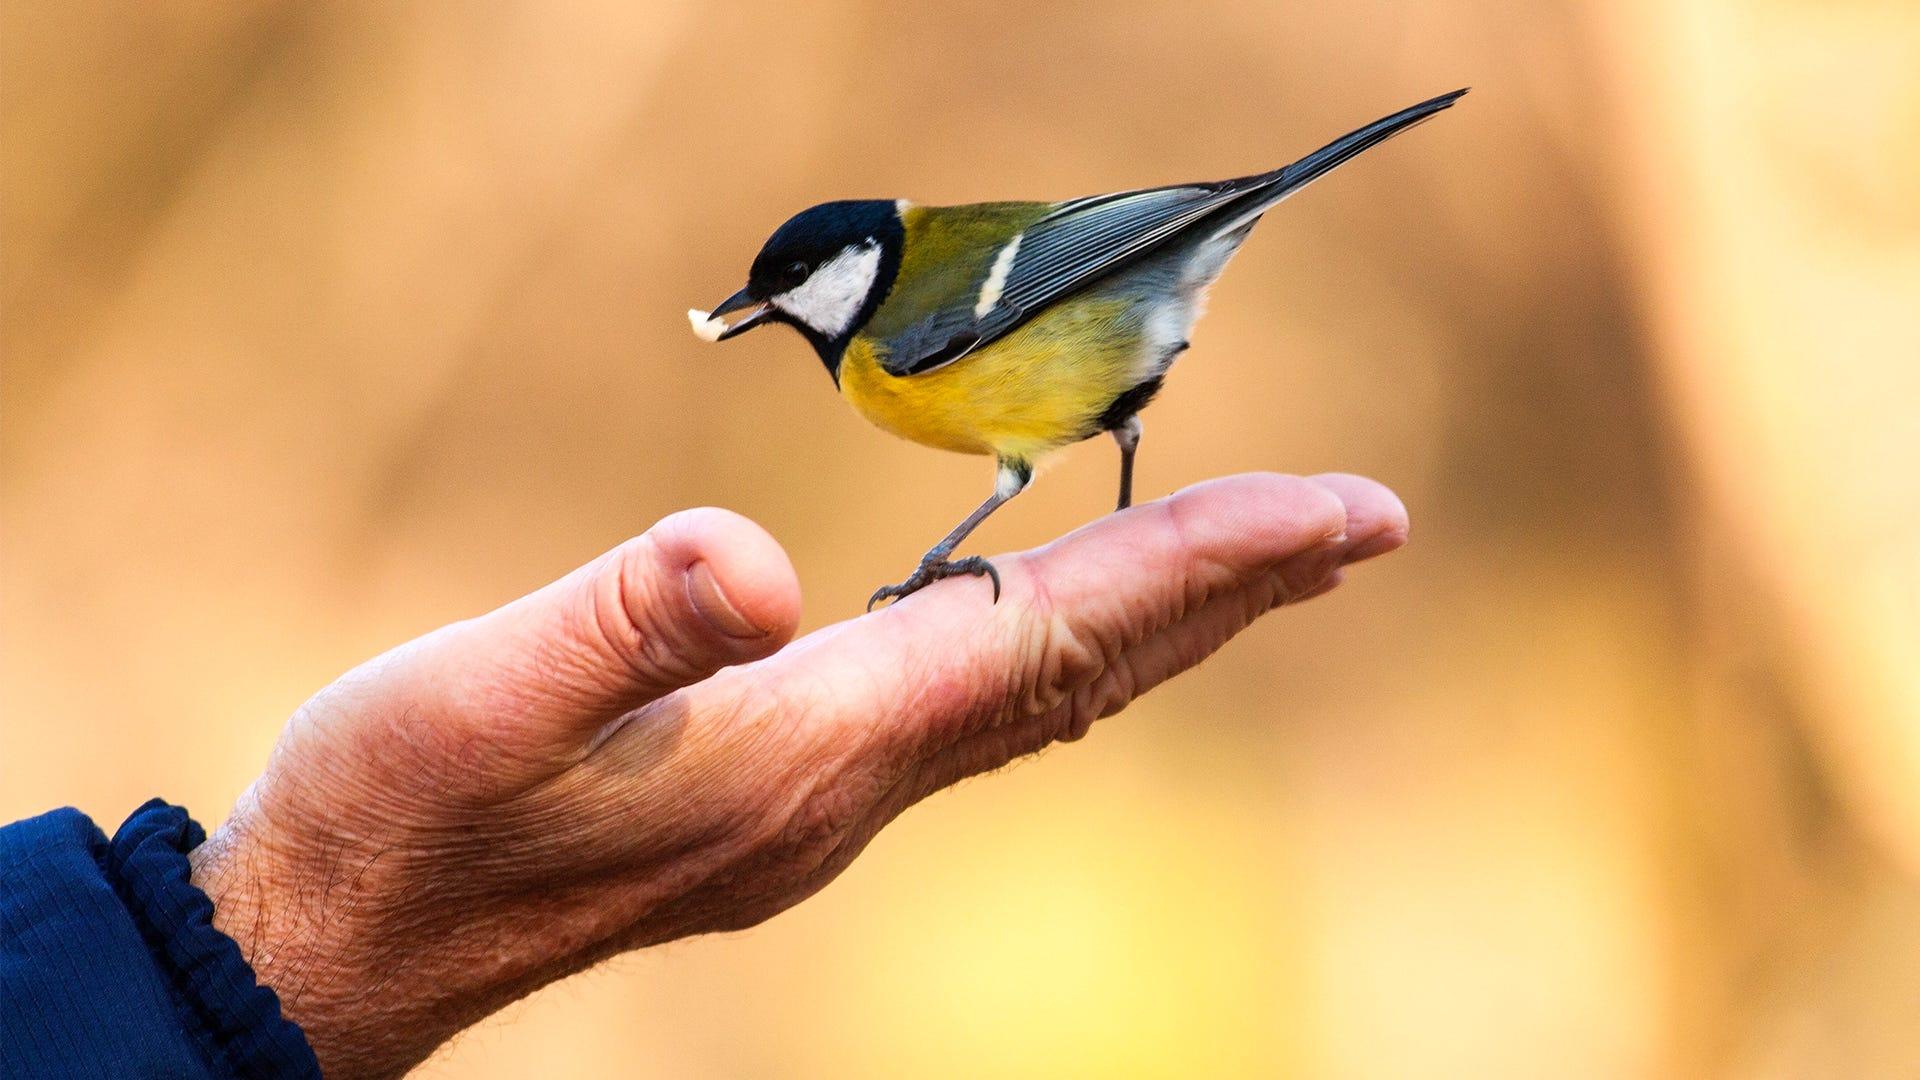 Bird Conservation: Helping North America's Birds